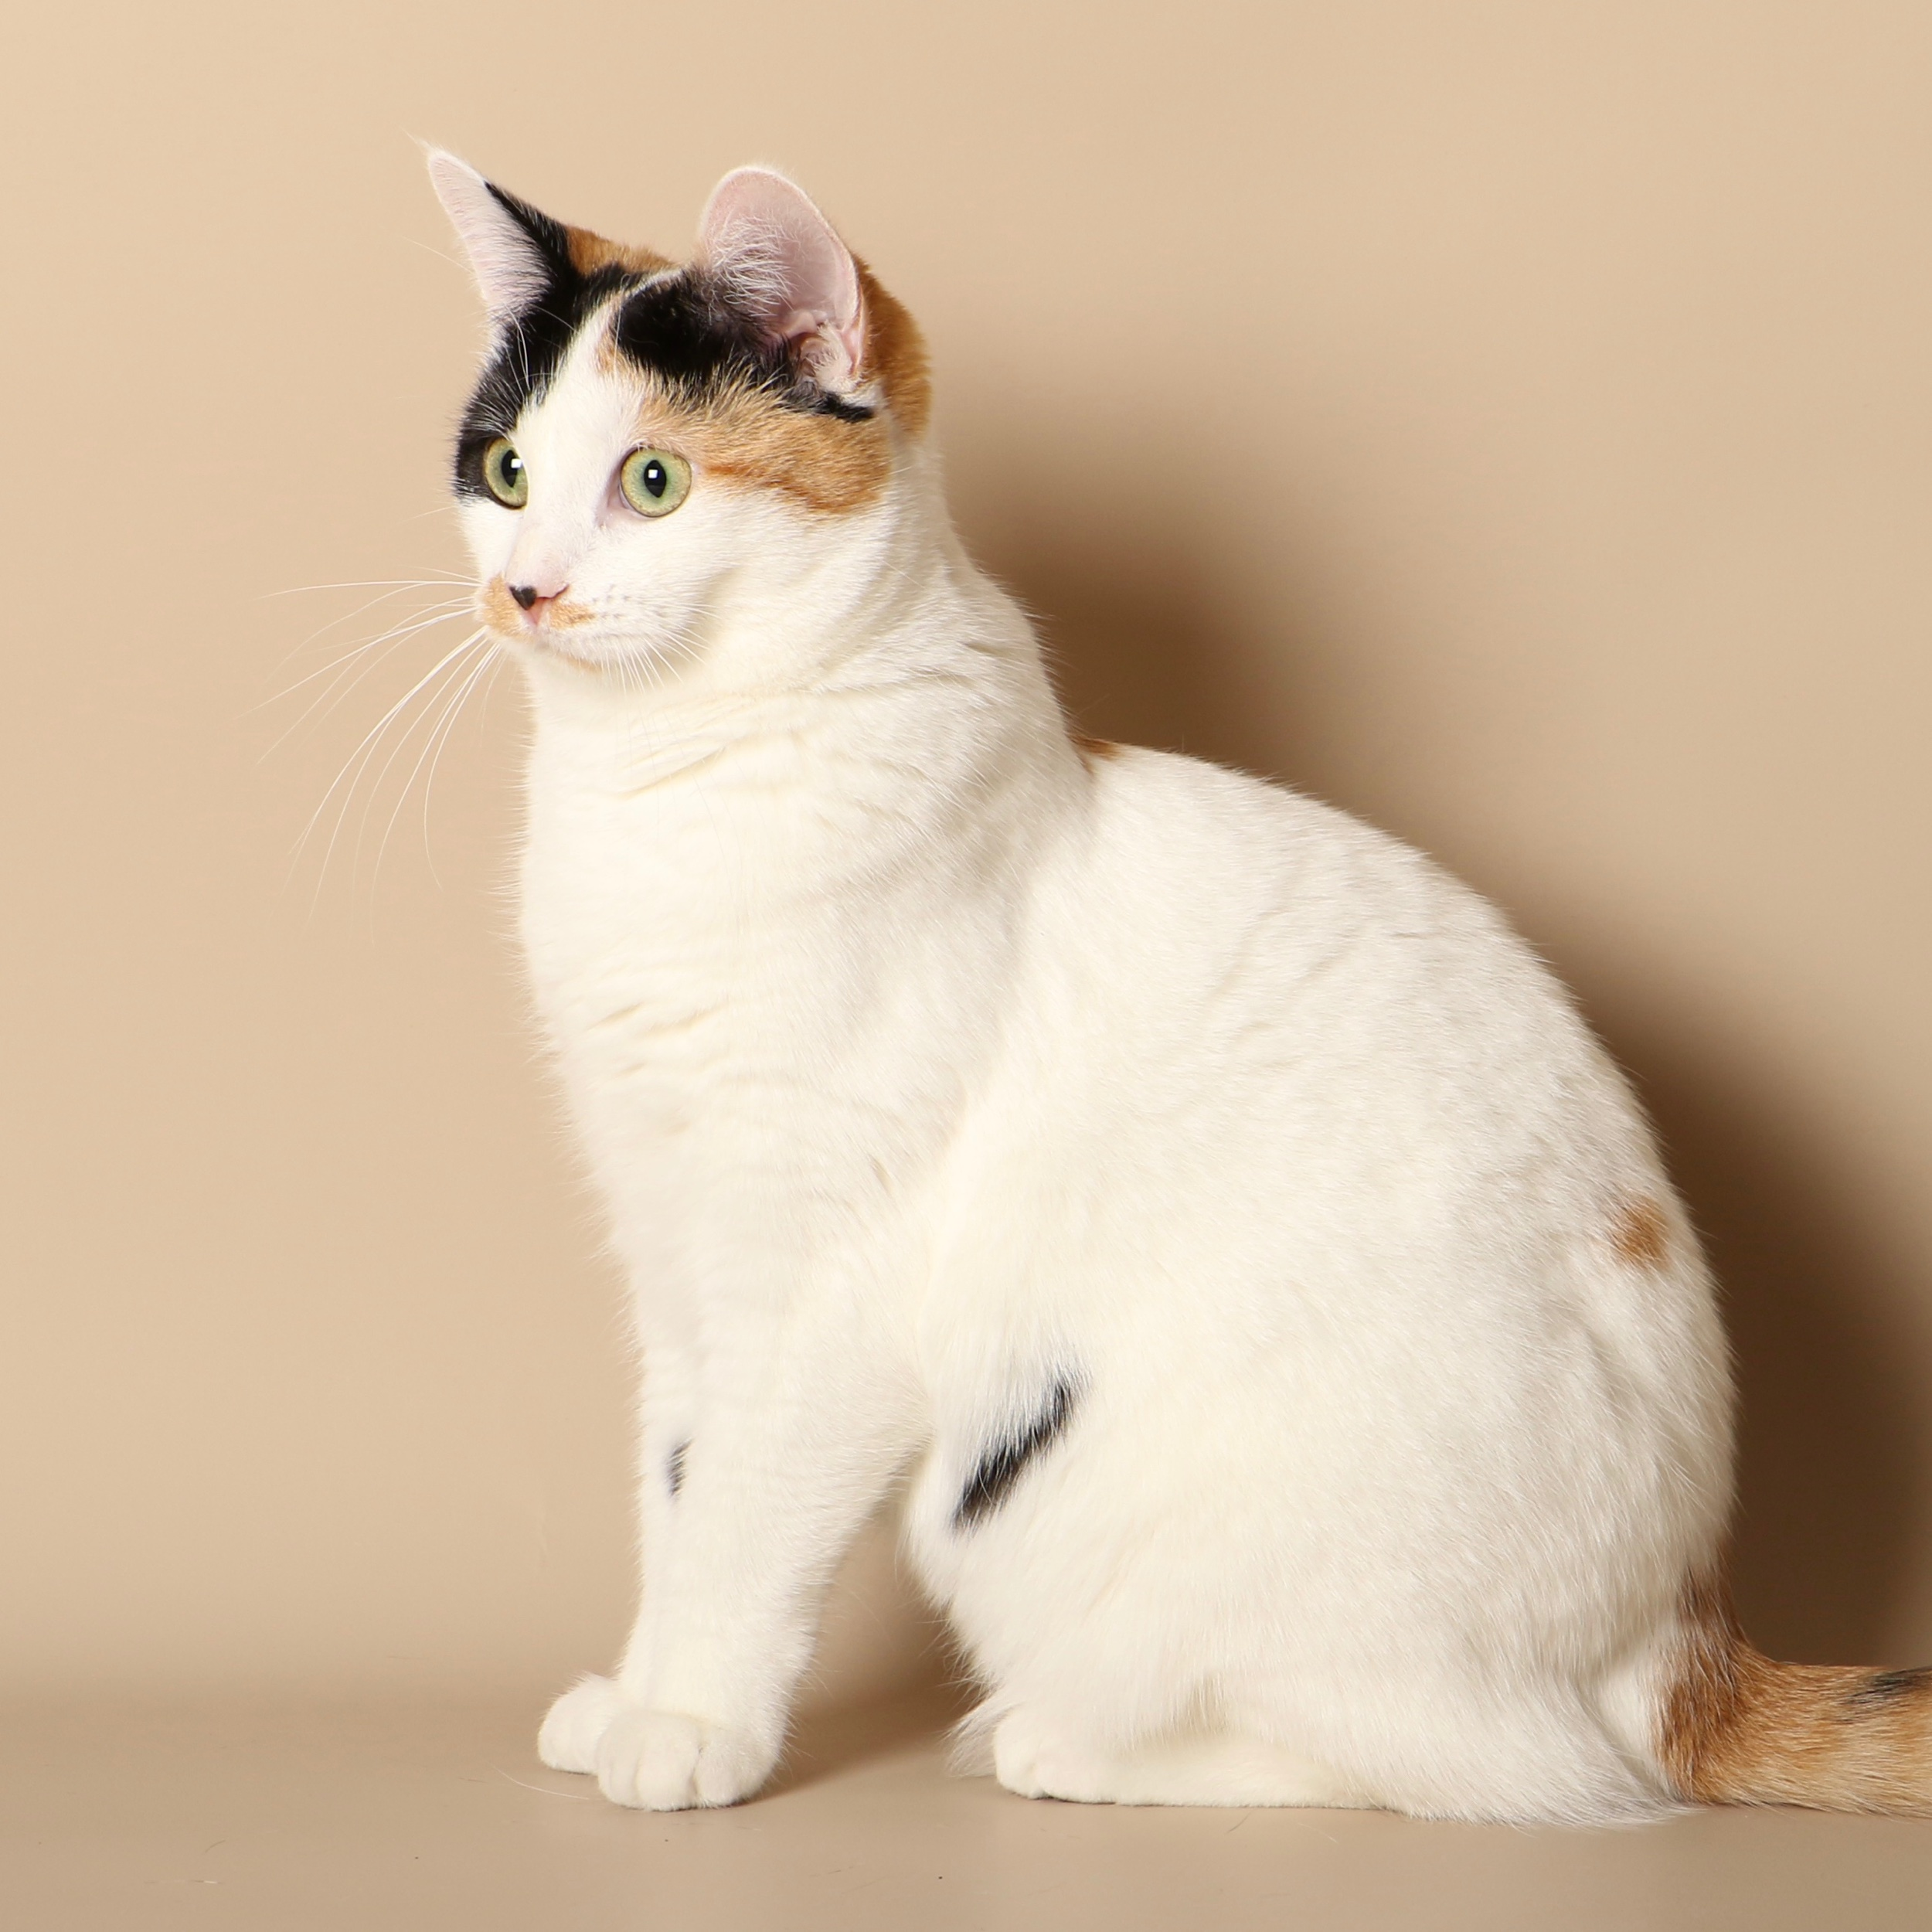 0966cats.jpeg